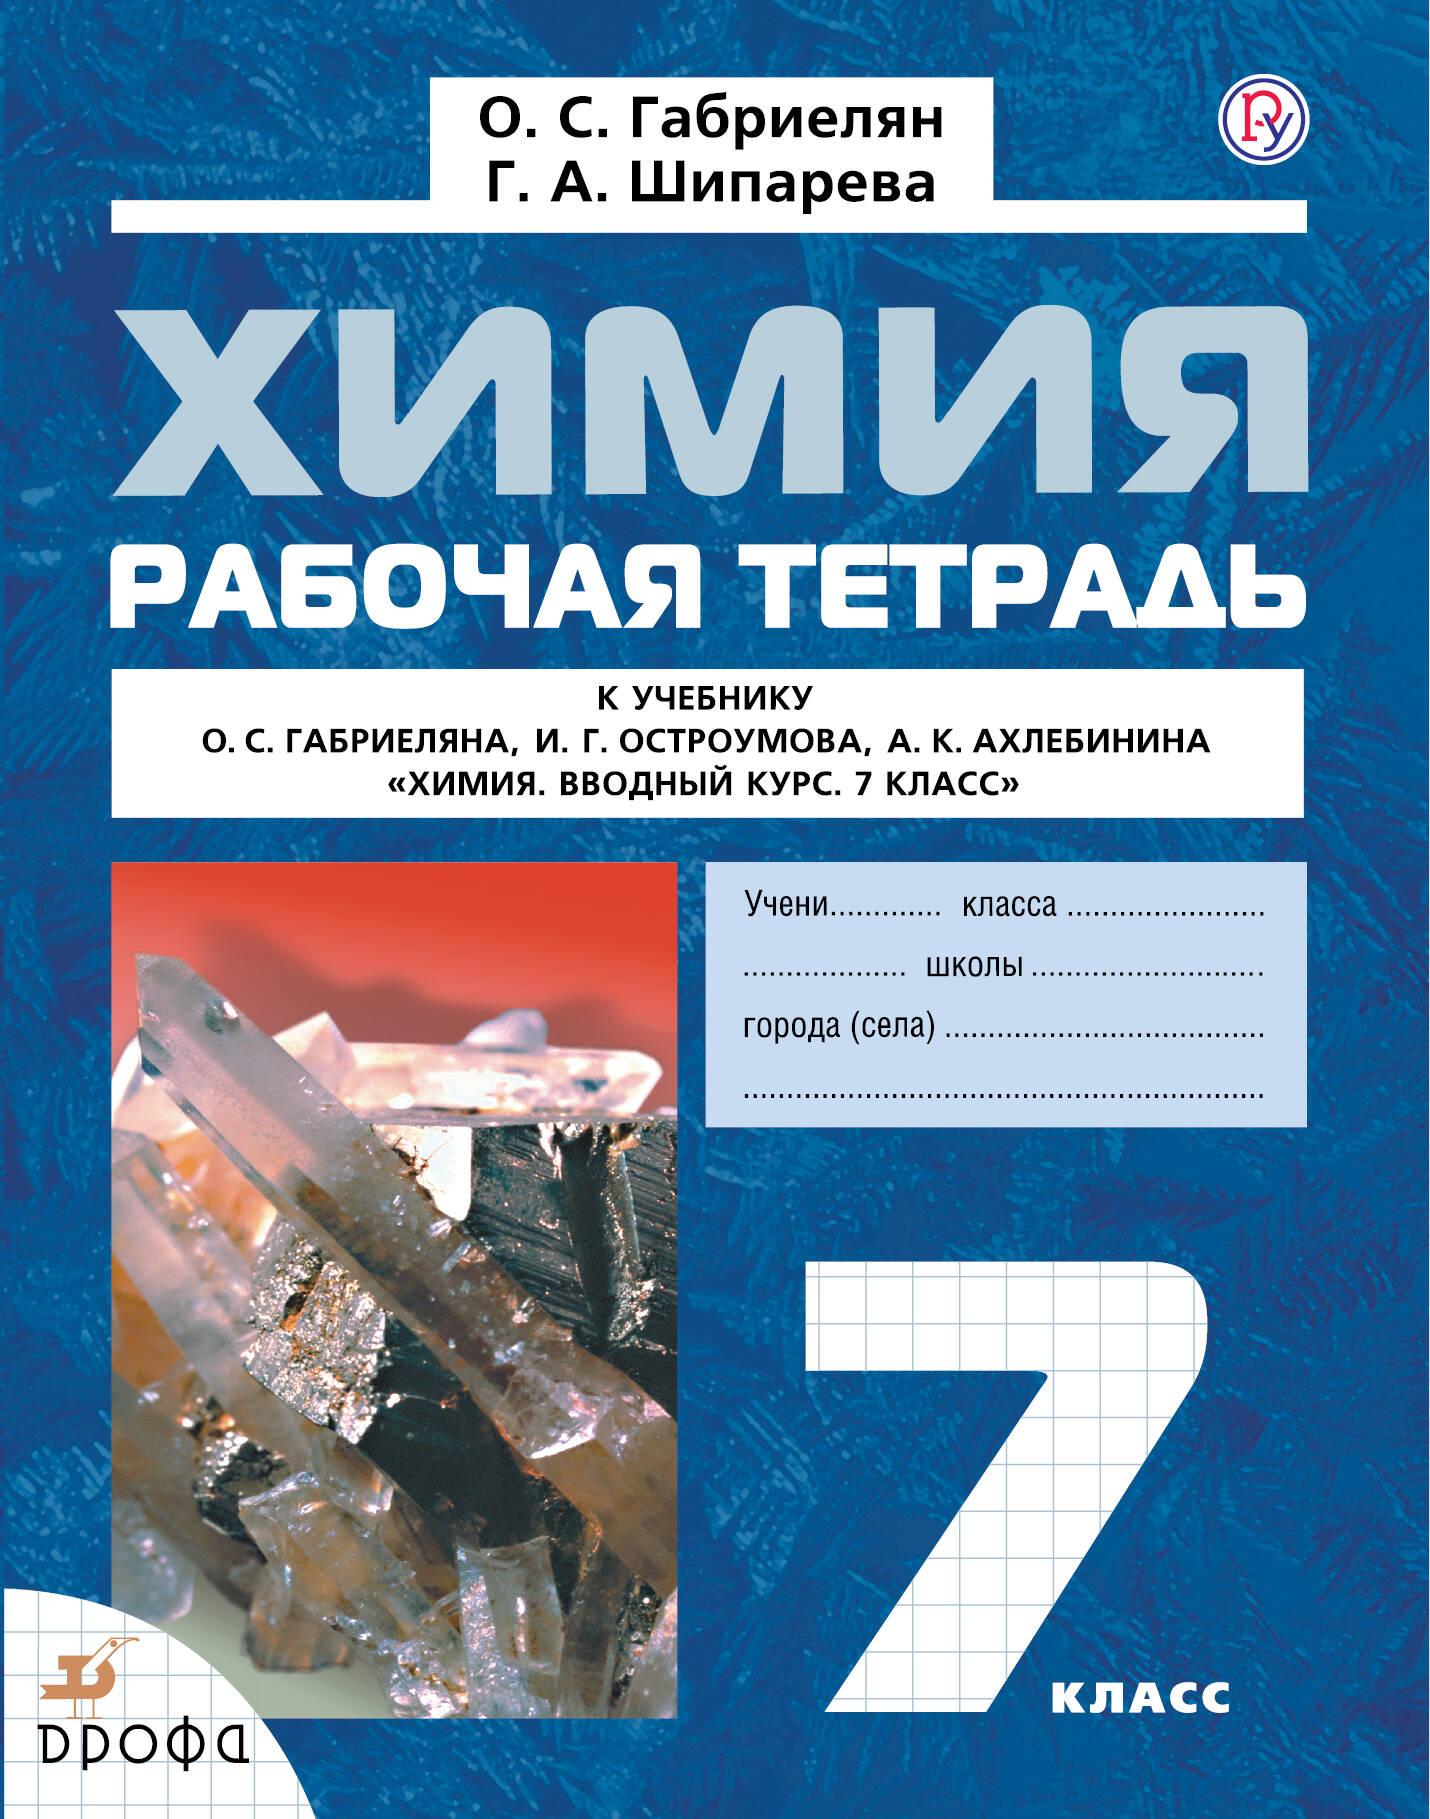 Габриелян О.С., Шипарёва Г.А. Химия. 7 класс. Рабочая тетрадь.